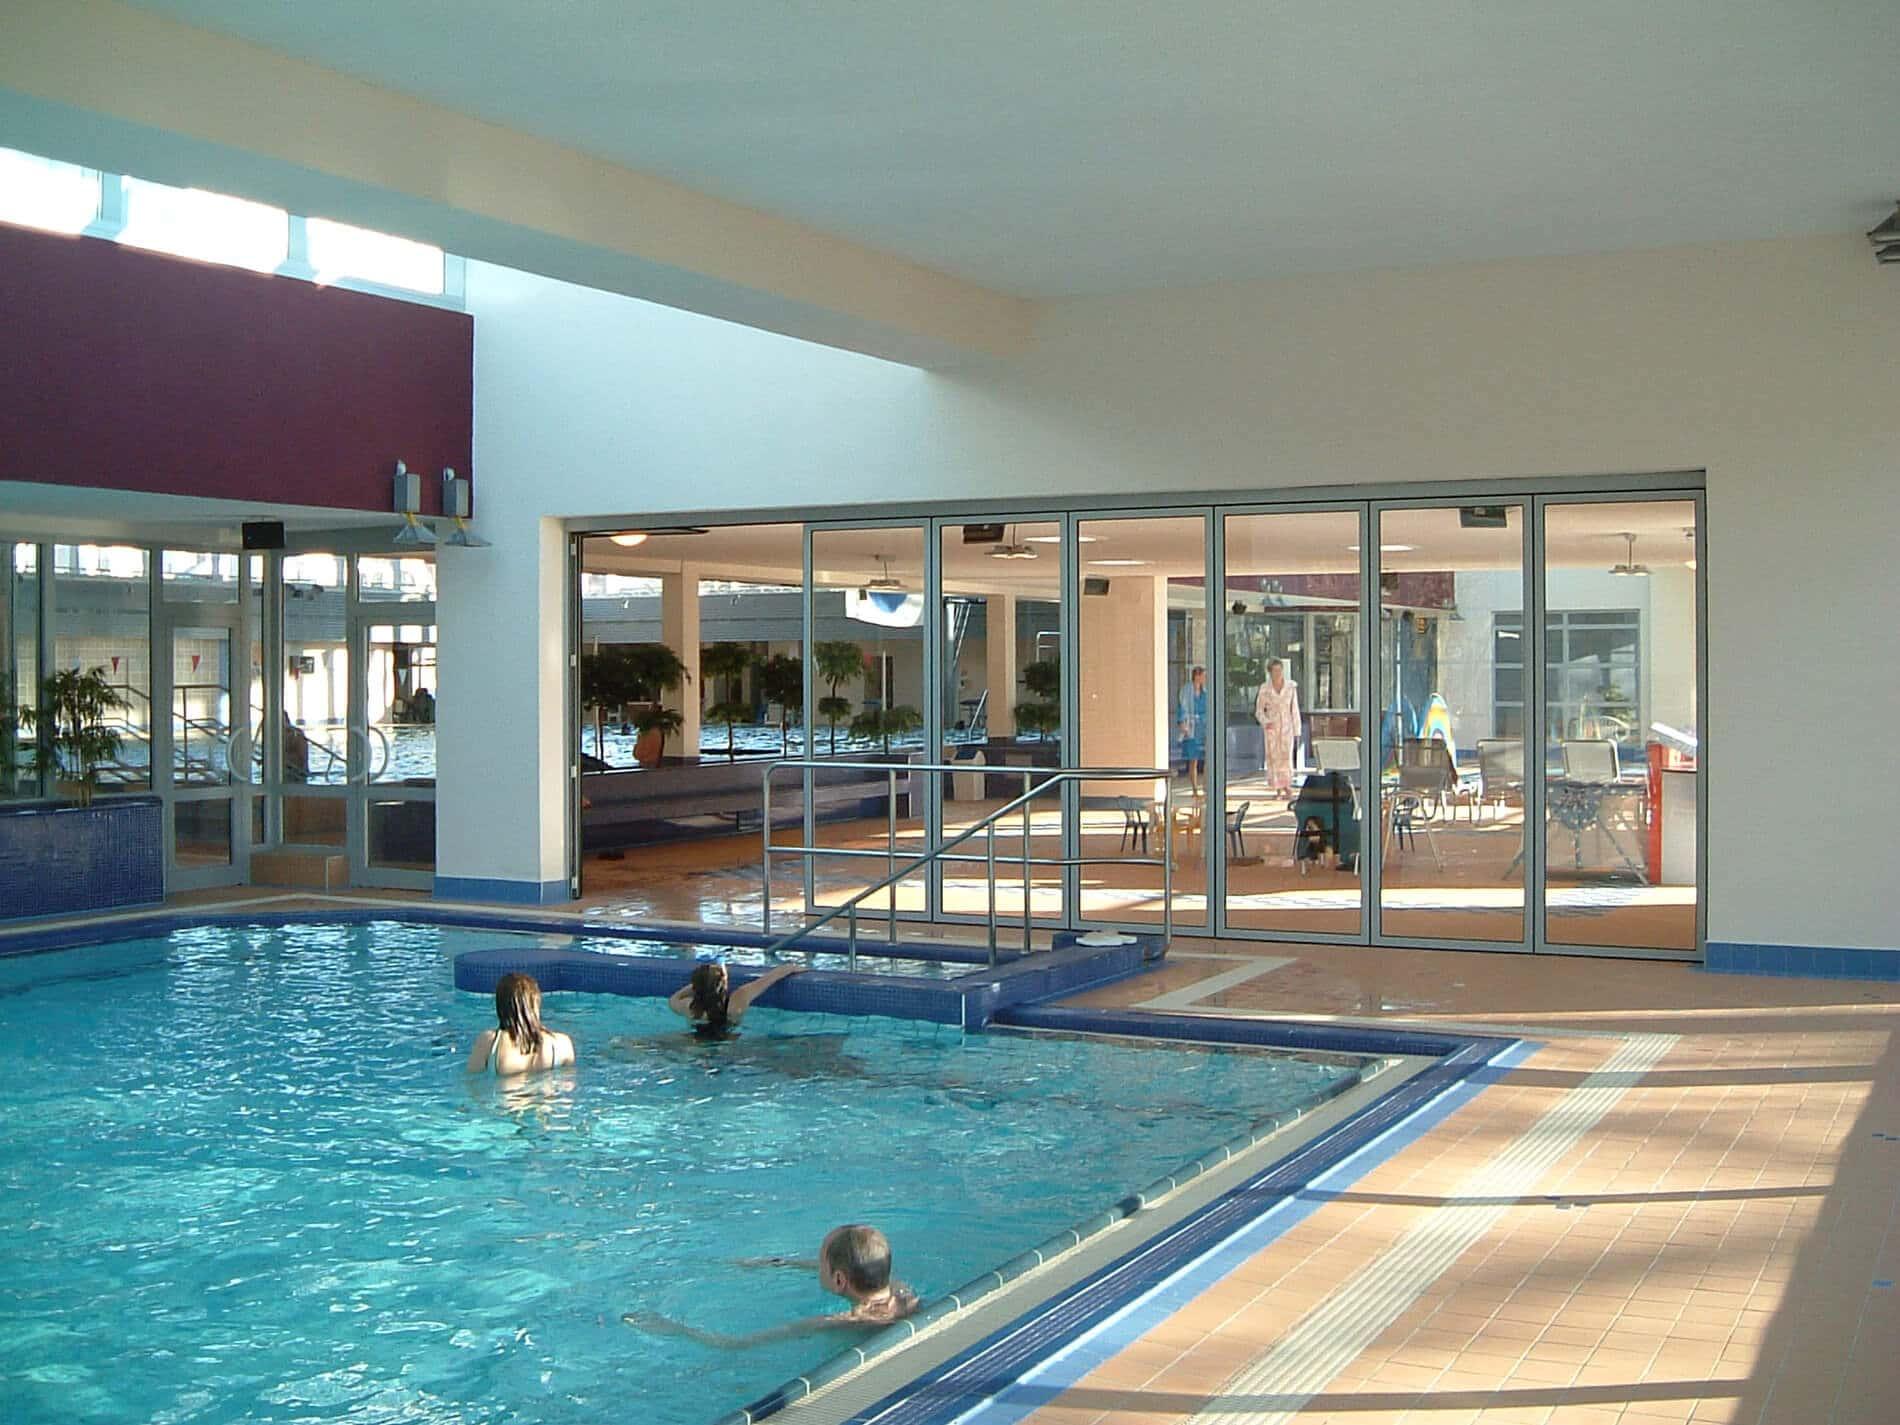 Faltwand in Aluminium für Schwimmbad